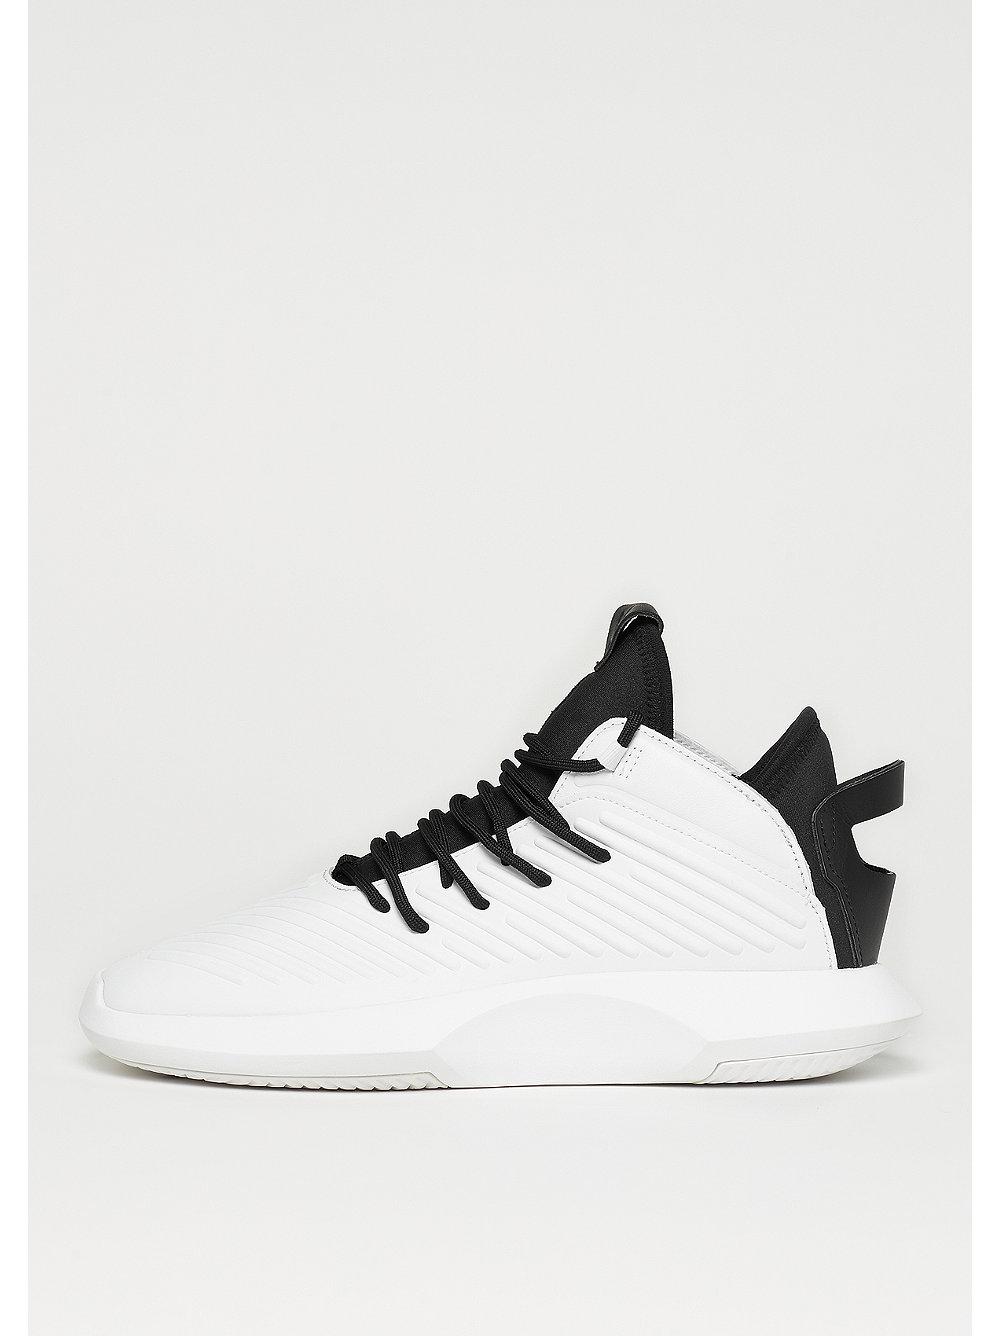 adidas Performance Crazy 1 ADV core black/footw...